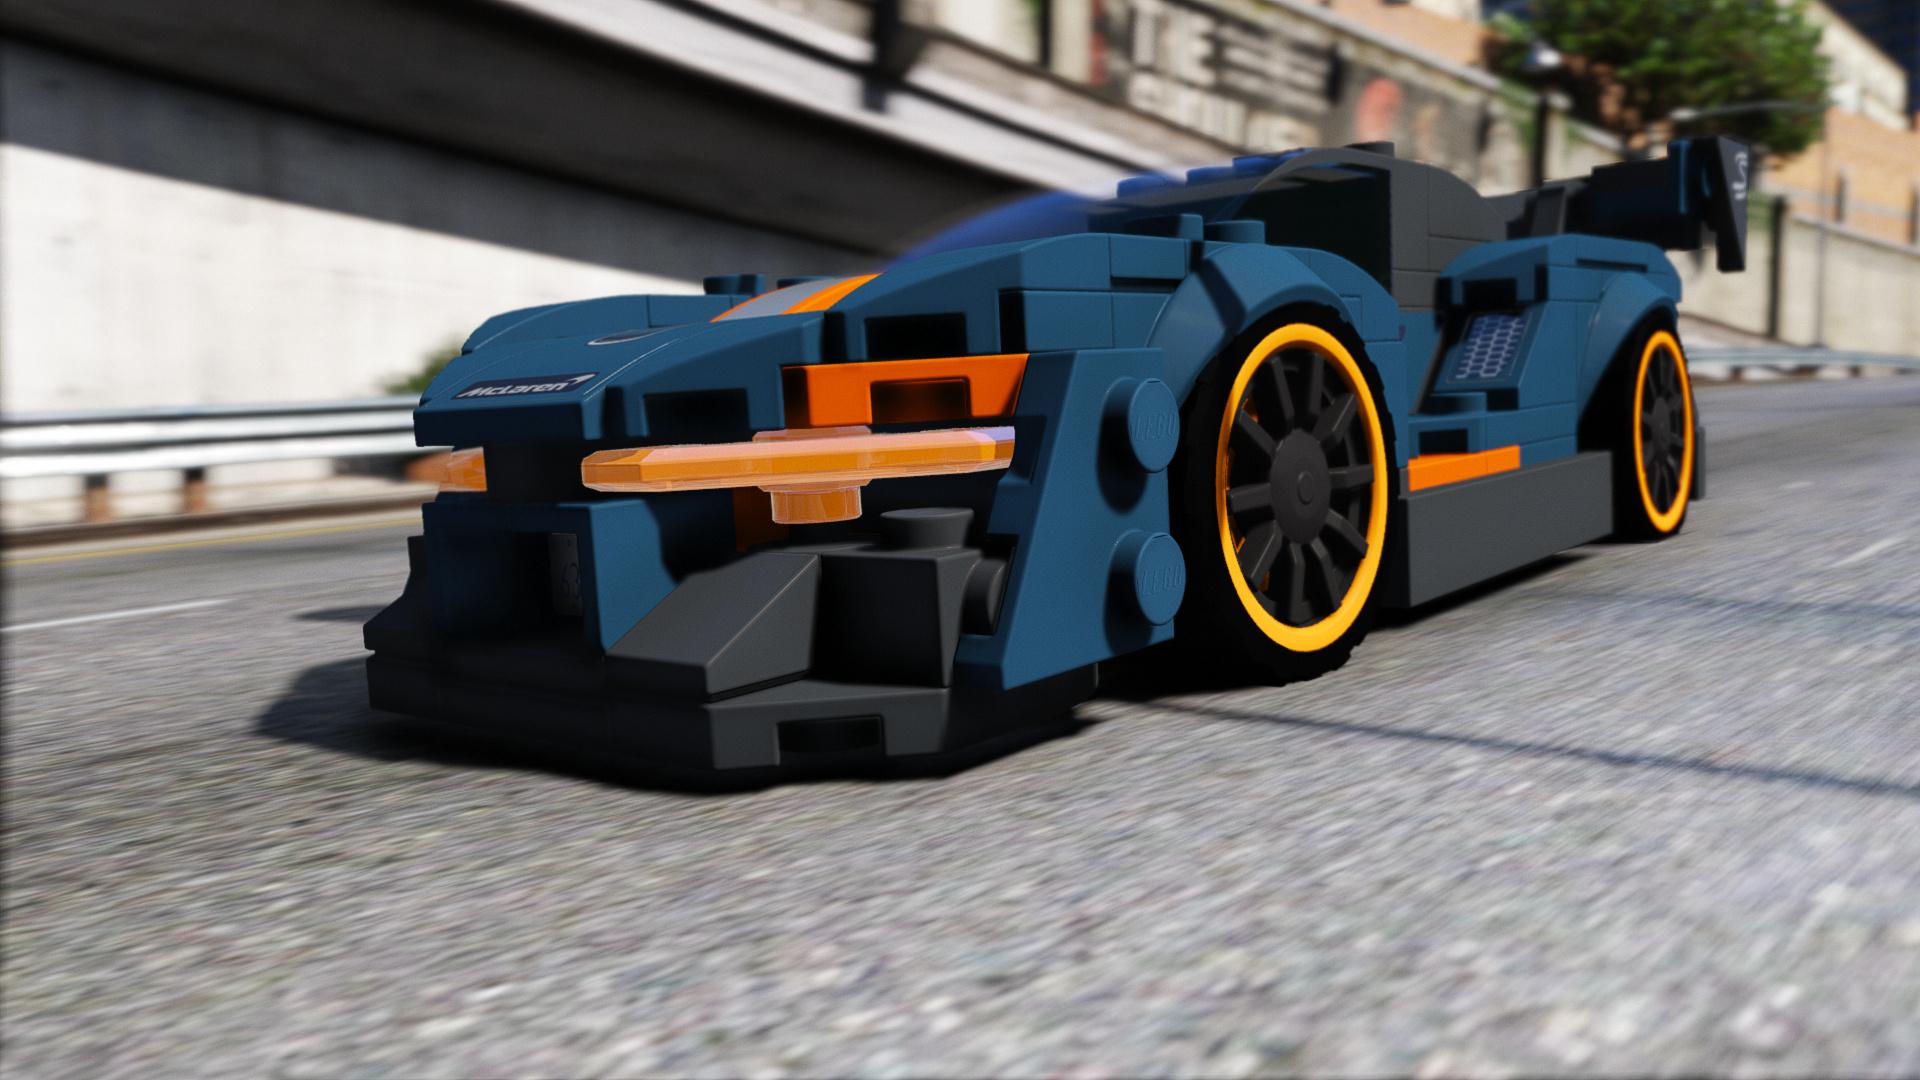 LEGO Mclaren Senna 2019 [Add-On / Replace | Template | OIV] 1.0